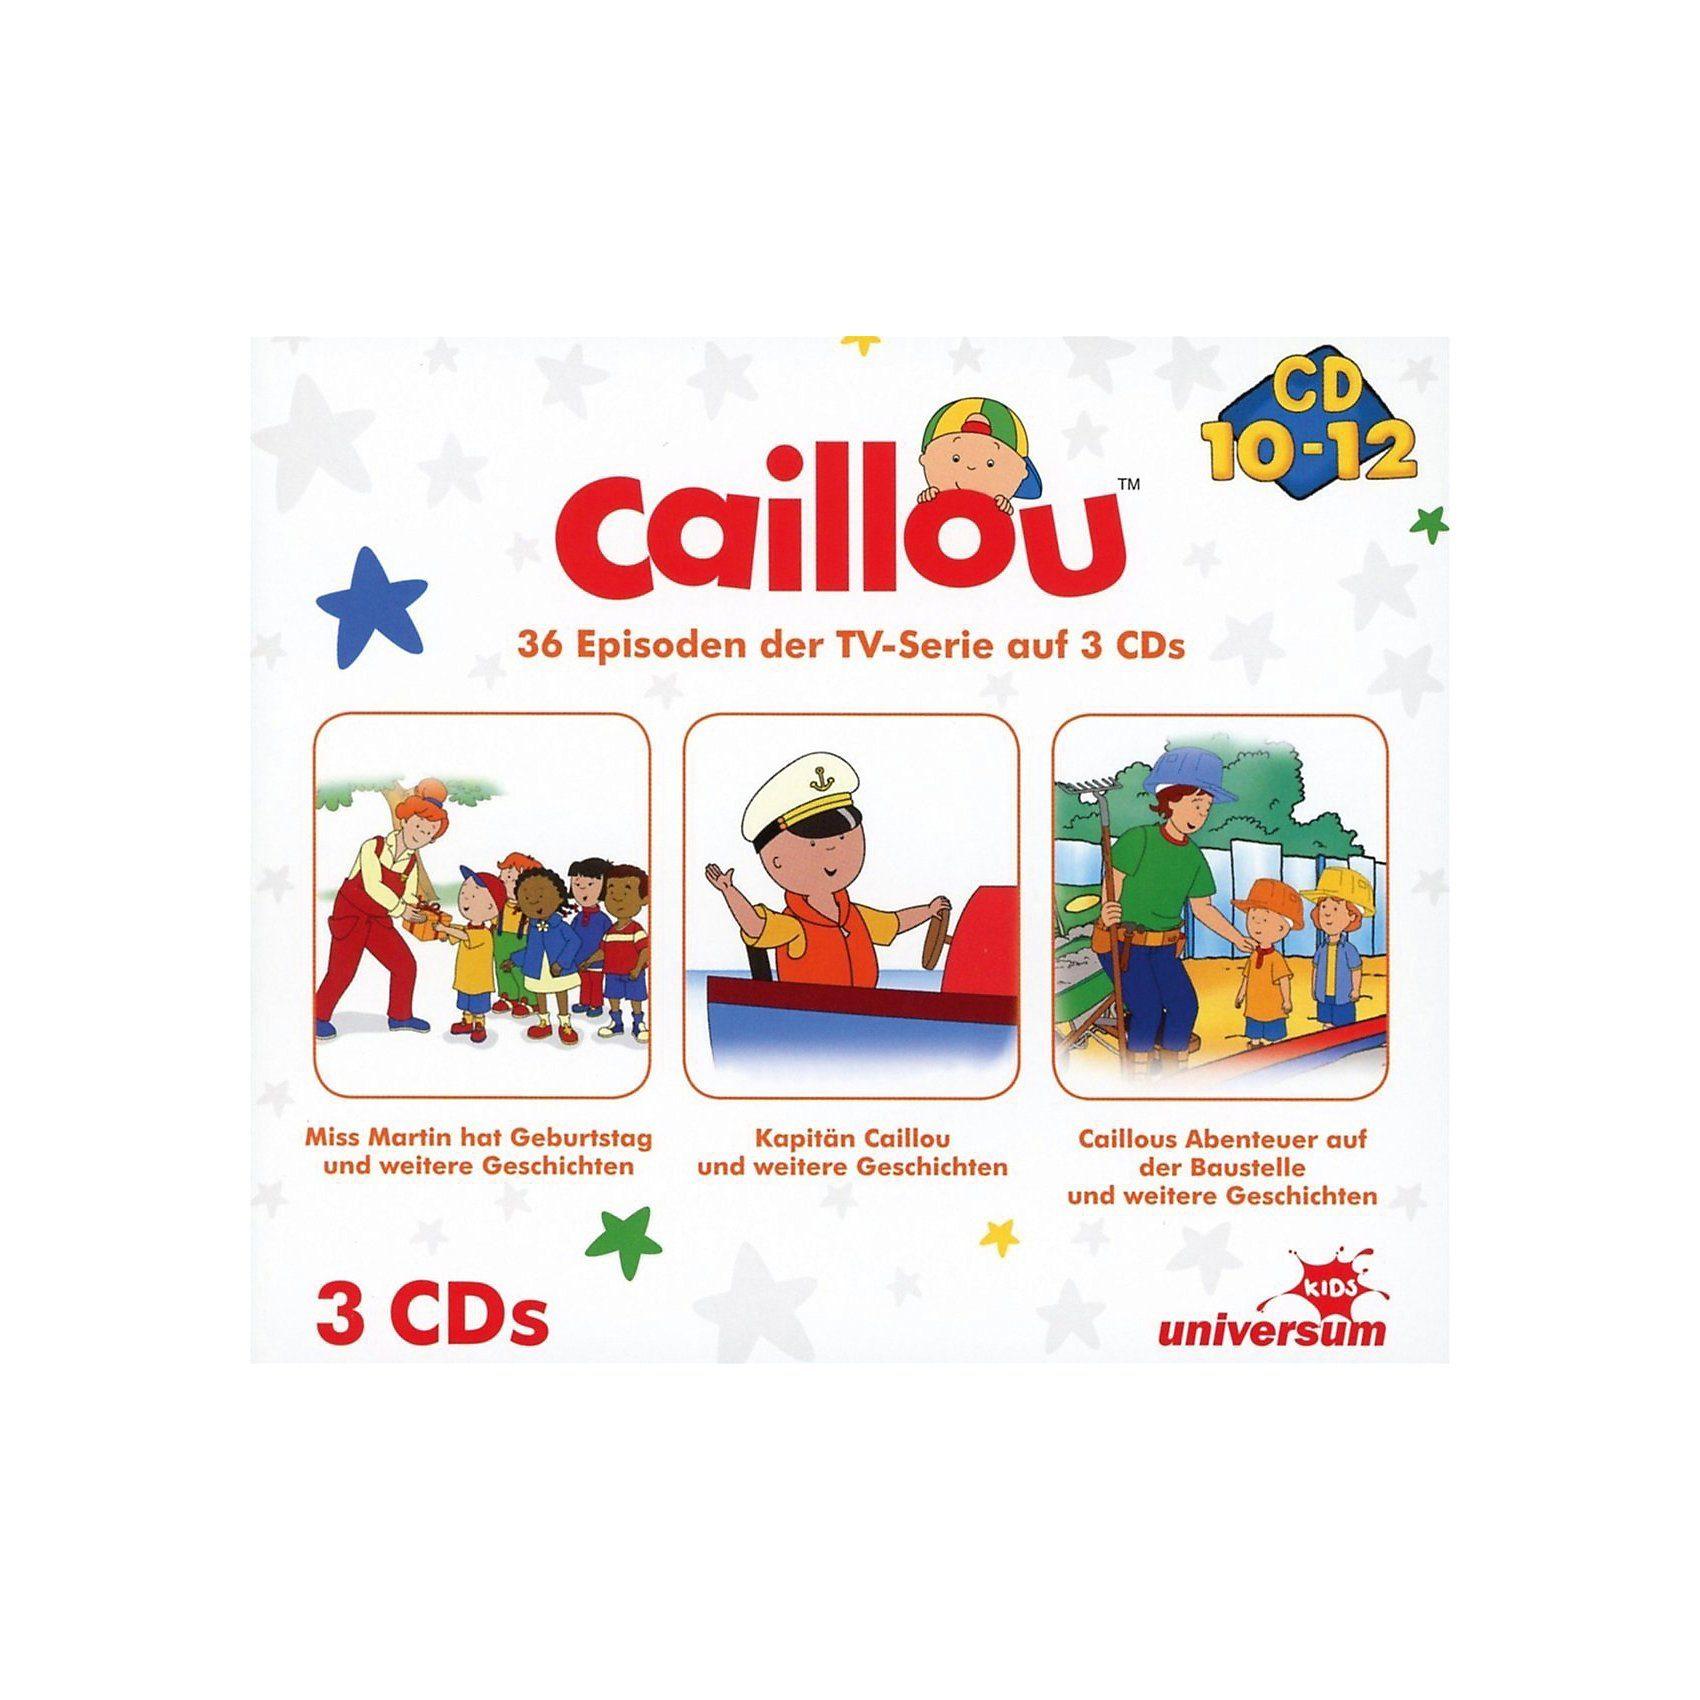 CD Caillou Hörspielbox 4 (CD 10-12)(3 CDs)